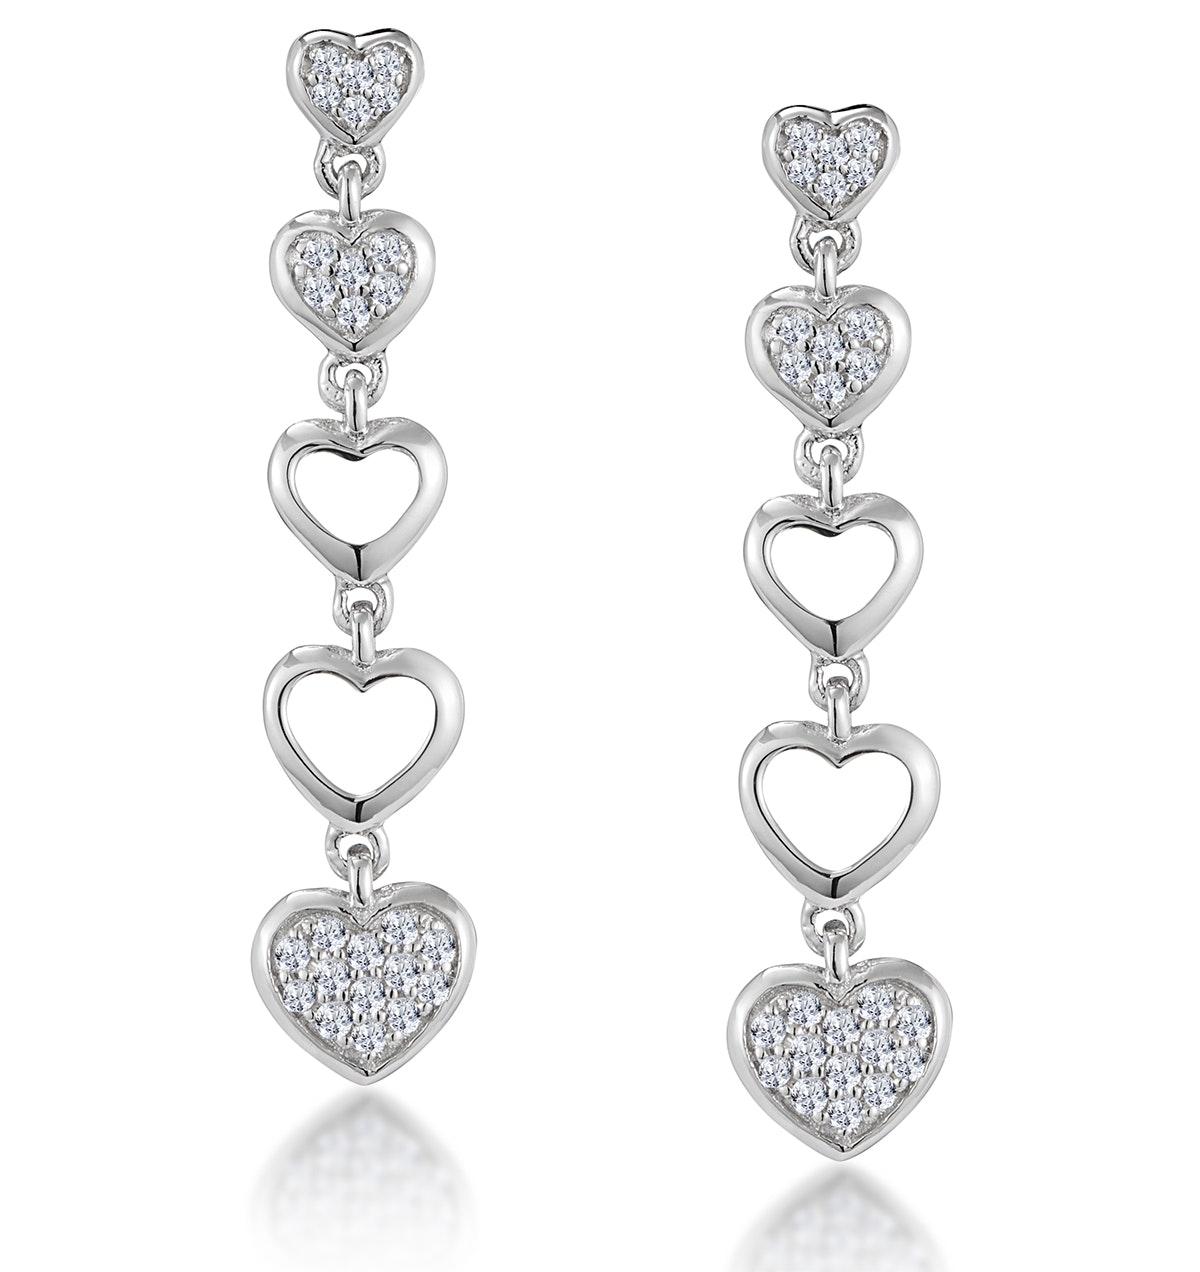 Stellato Collection Drop Diamond Heart Earrings in 9K White Gold